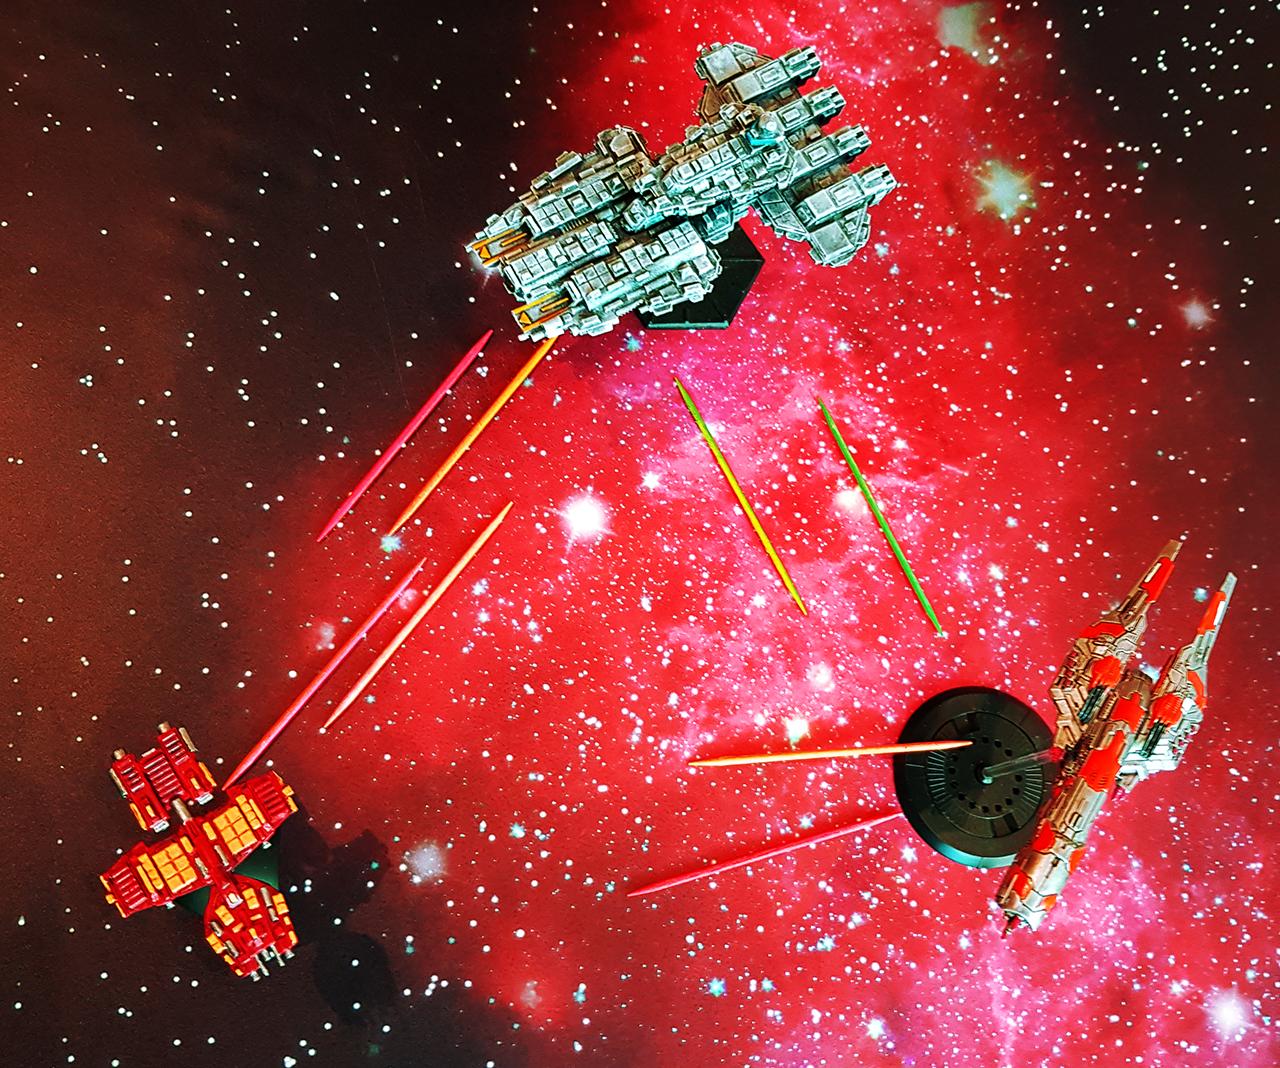 [Full Thrust] Arminace bastelt Kometen und Laserstrahlen... Tut-l-3